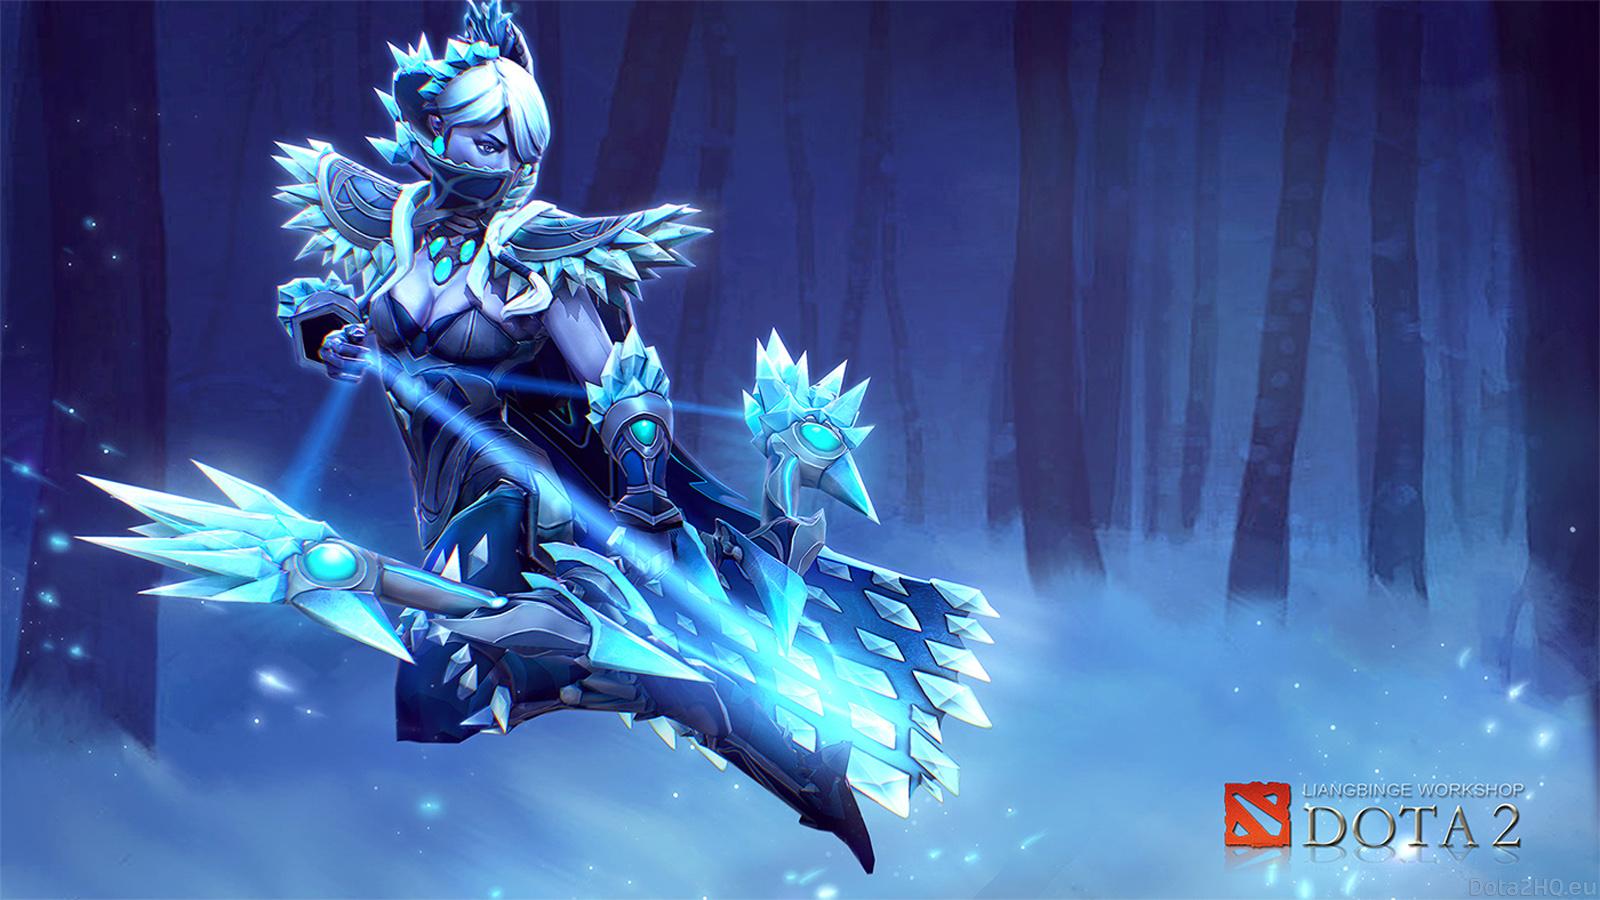 Best Dota 2 Wallpaper Drow Ranger [The Shadow of Ice Drow] DOTA 2 1600x900